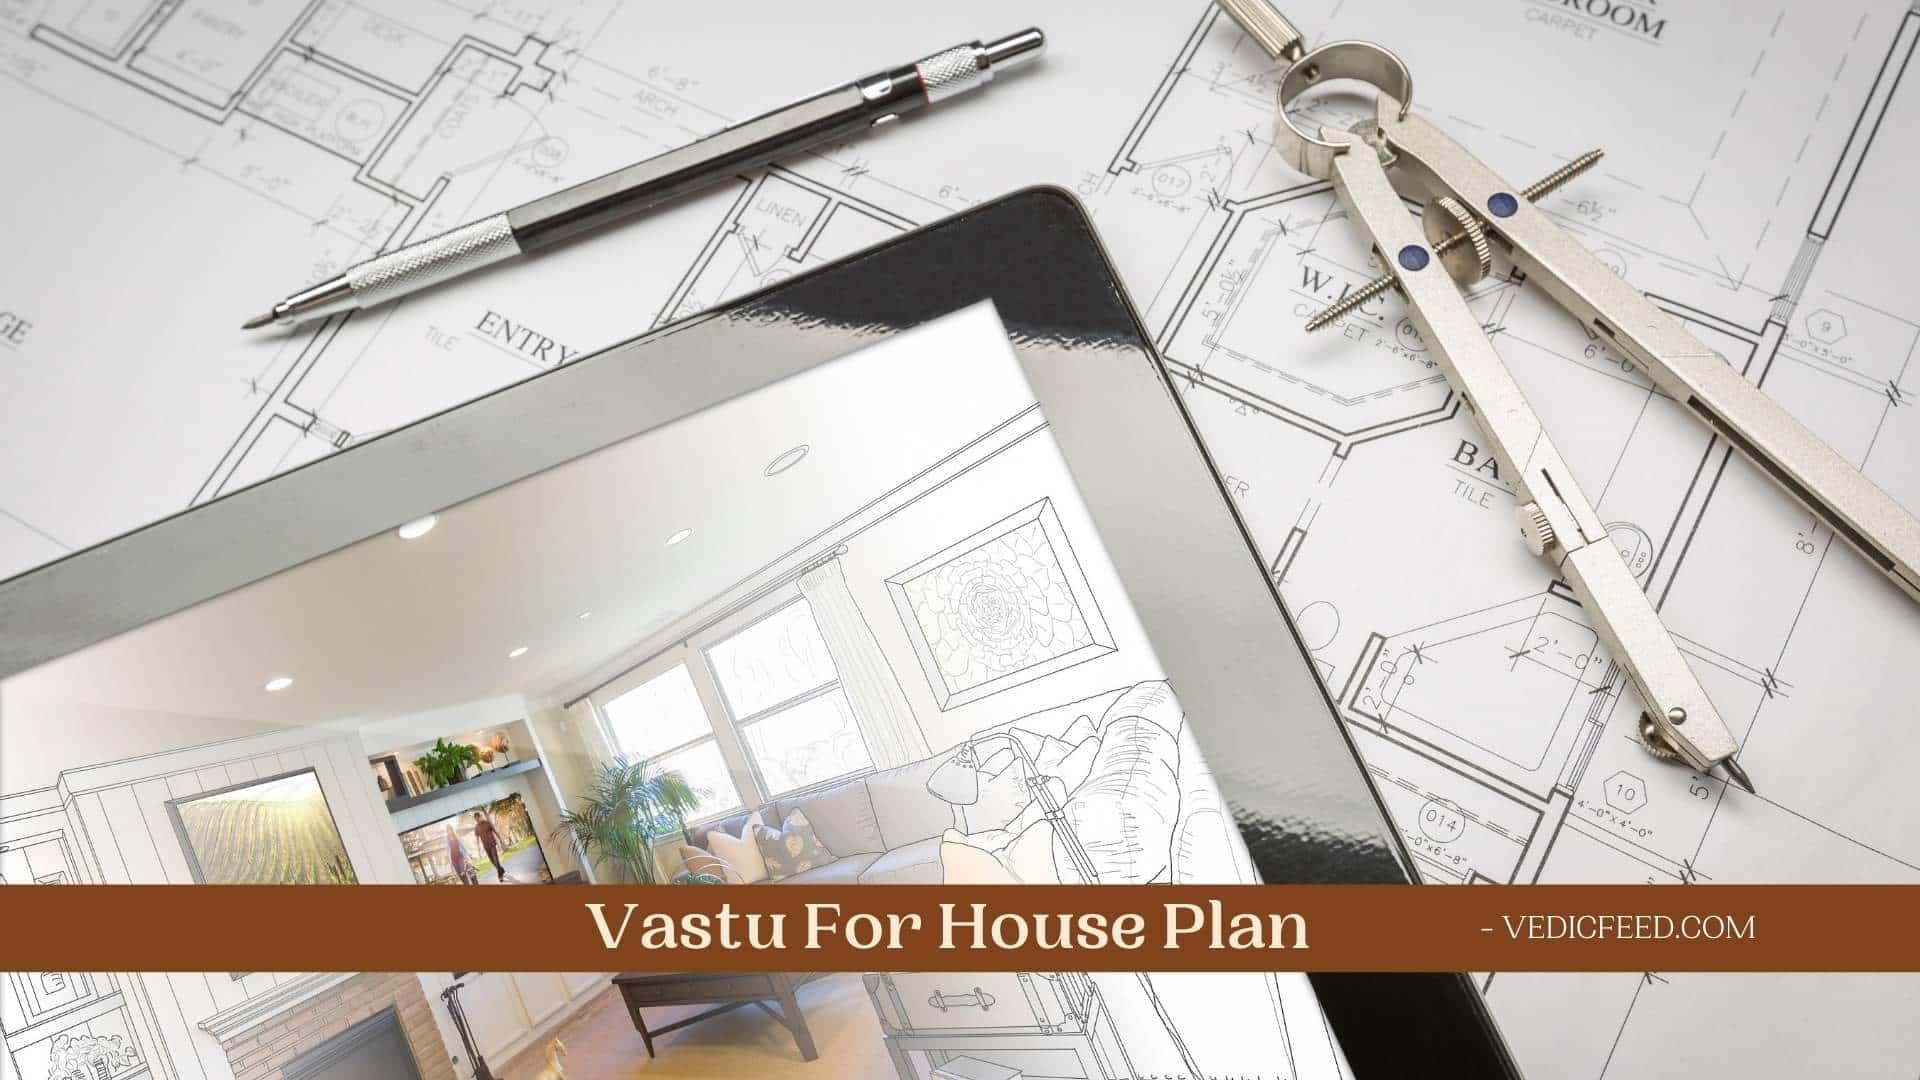 Vastu For House Plan